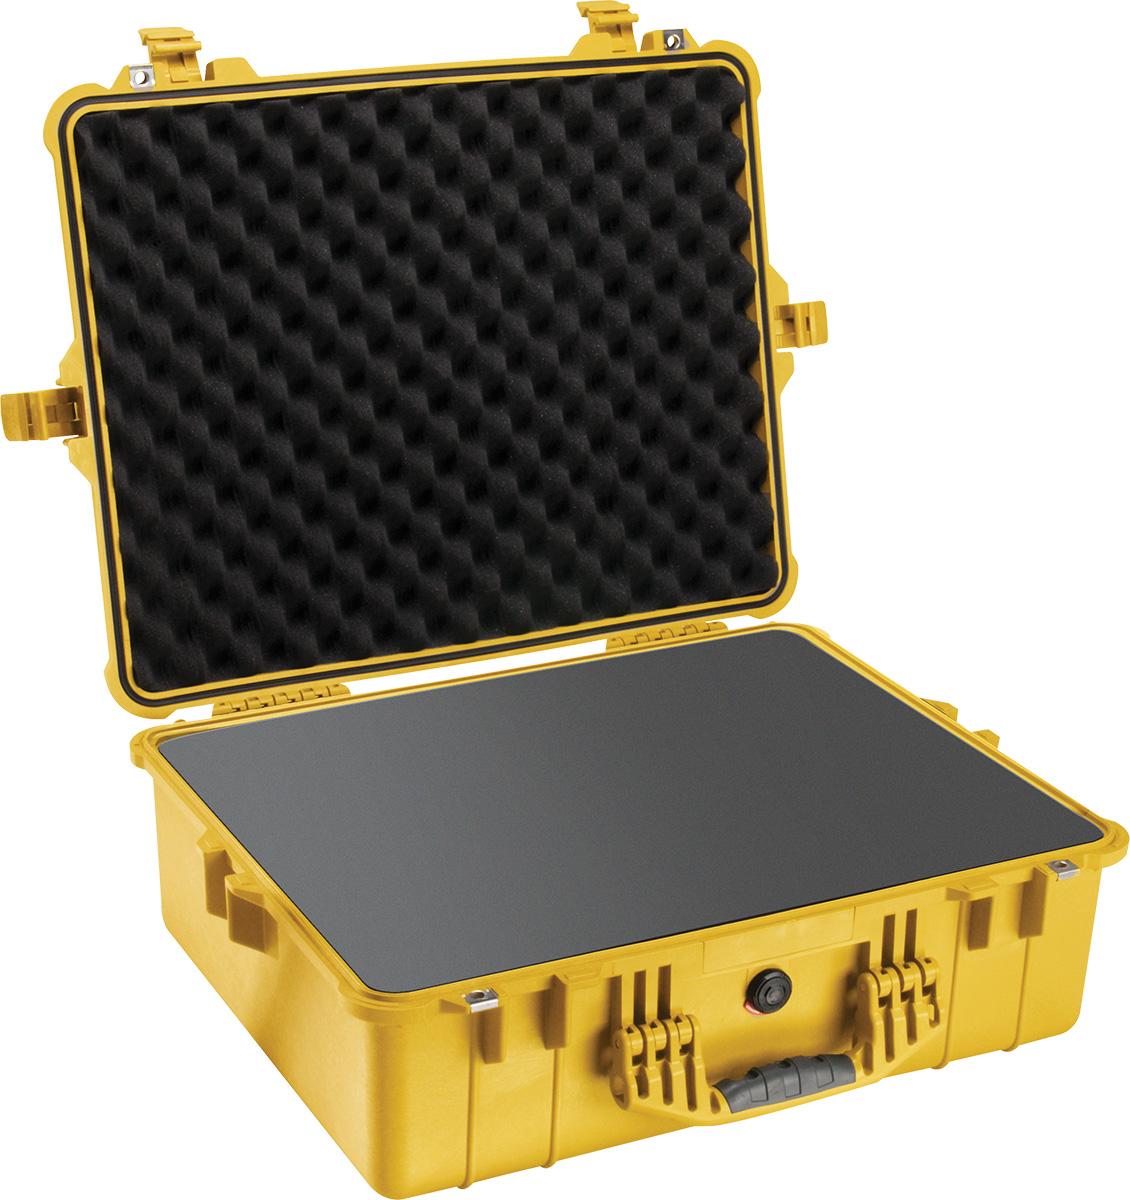 pelican 1600 yellow camera foam case